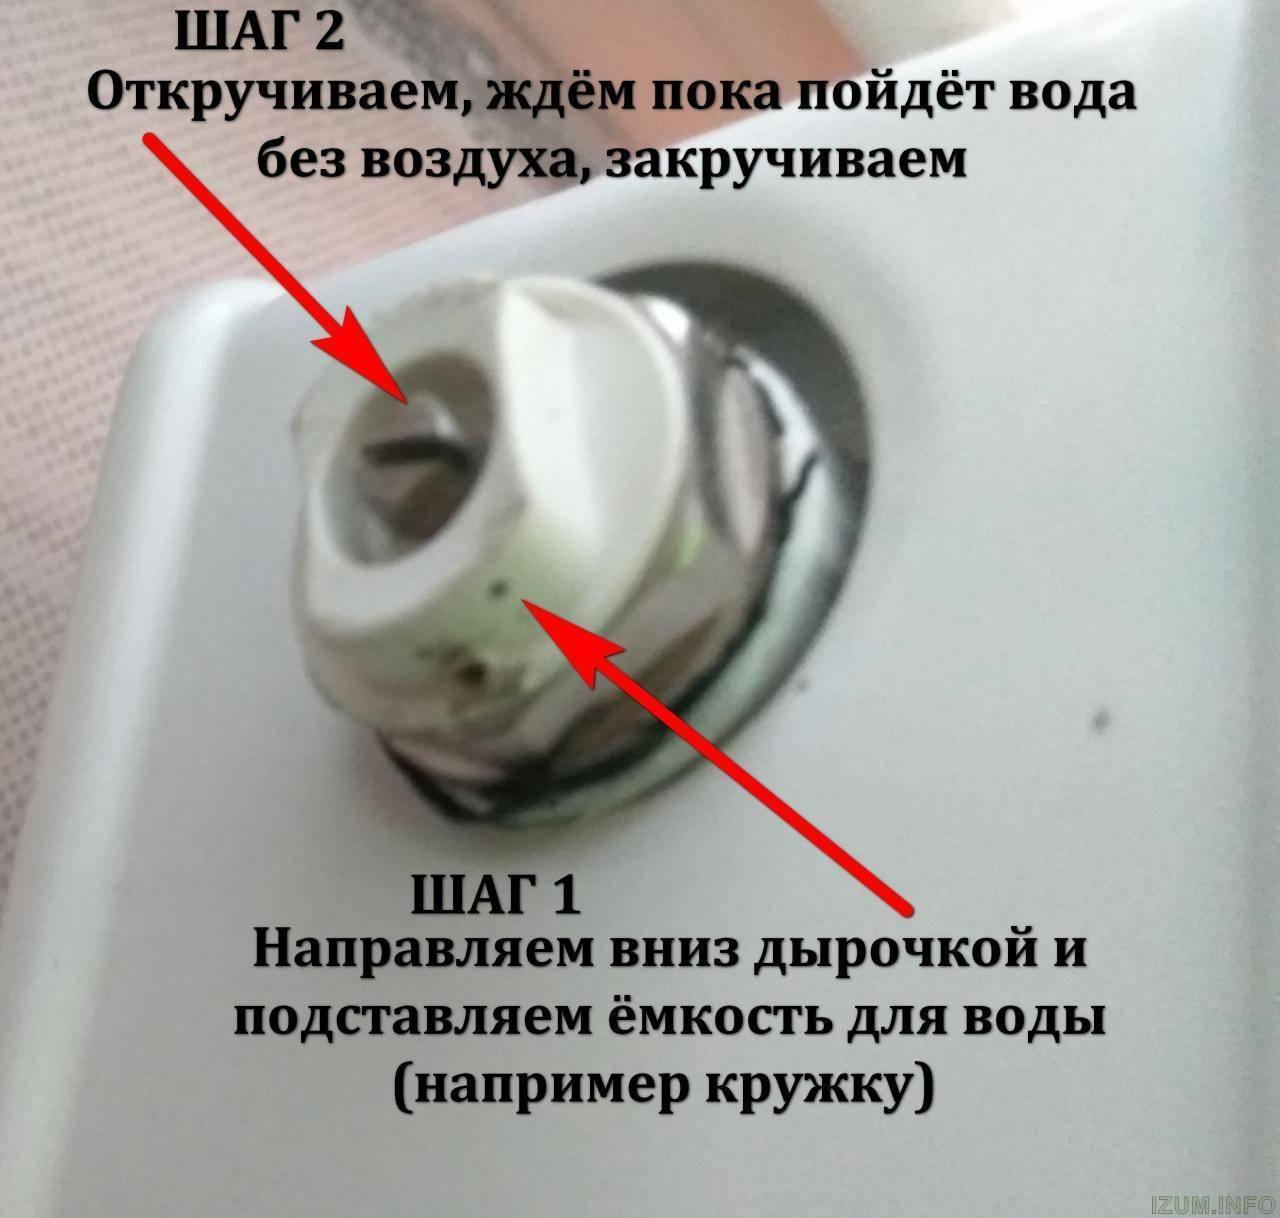 Кран маевского на батарее: принцип работы, разновидности